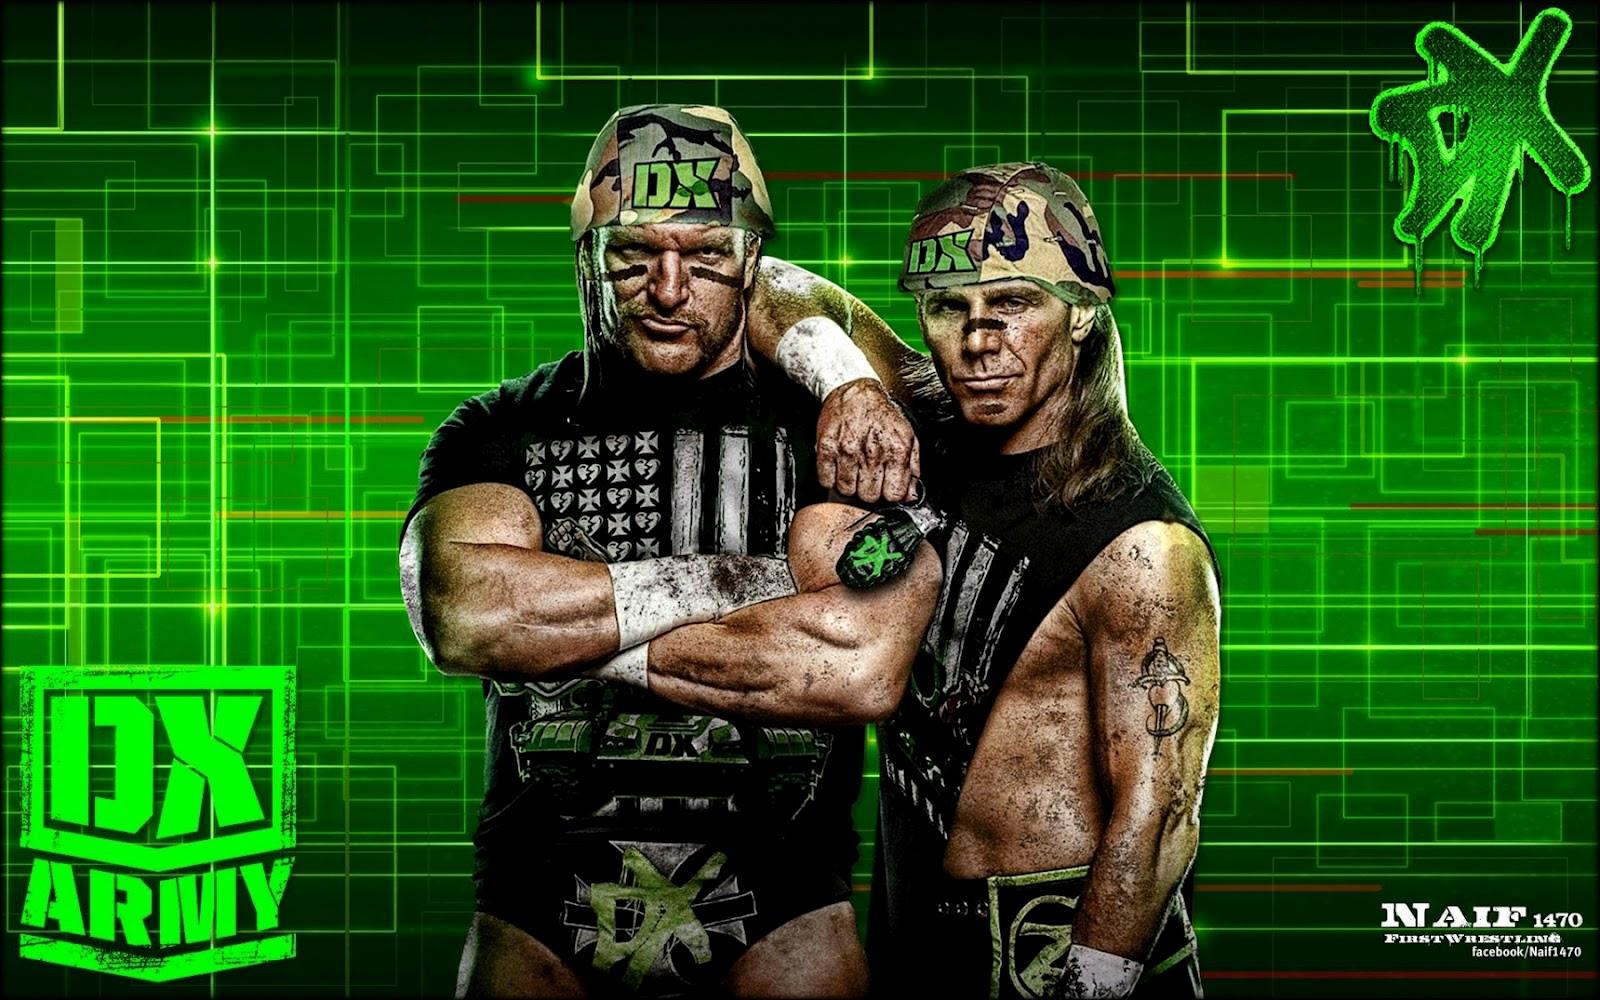 http://4.bp.blogspot.com/-EzhQBOLrKw0/UApkIPwSLeI/AAAAAAAADko/Szq0eRHsNpA/s1600/WWE_DX+%283%29.jpg